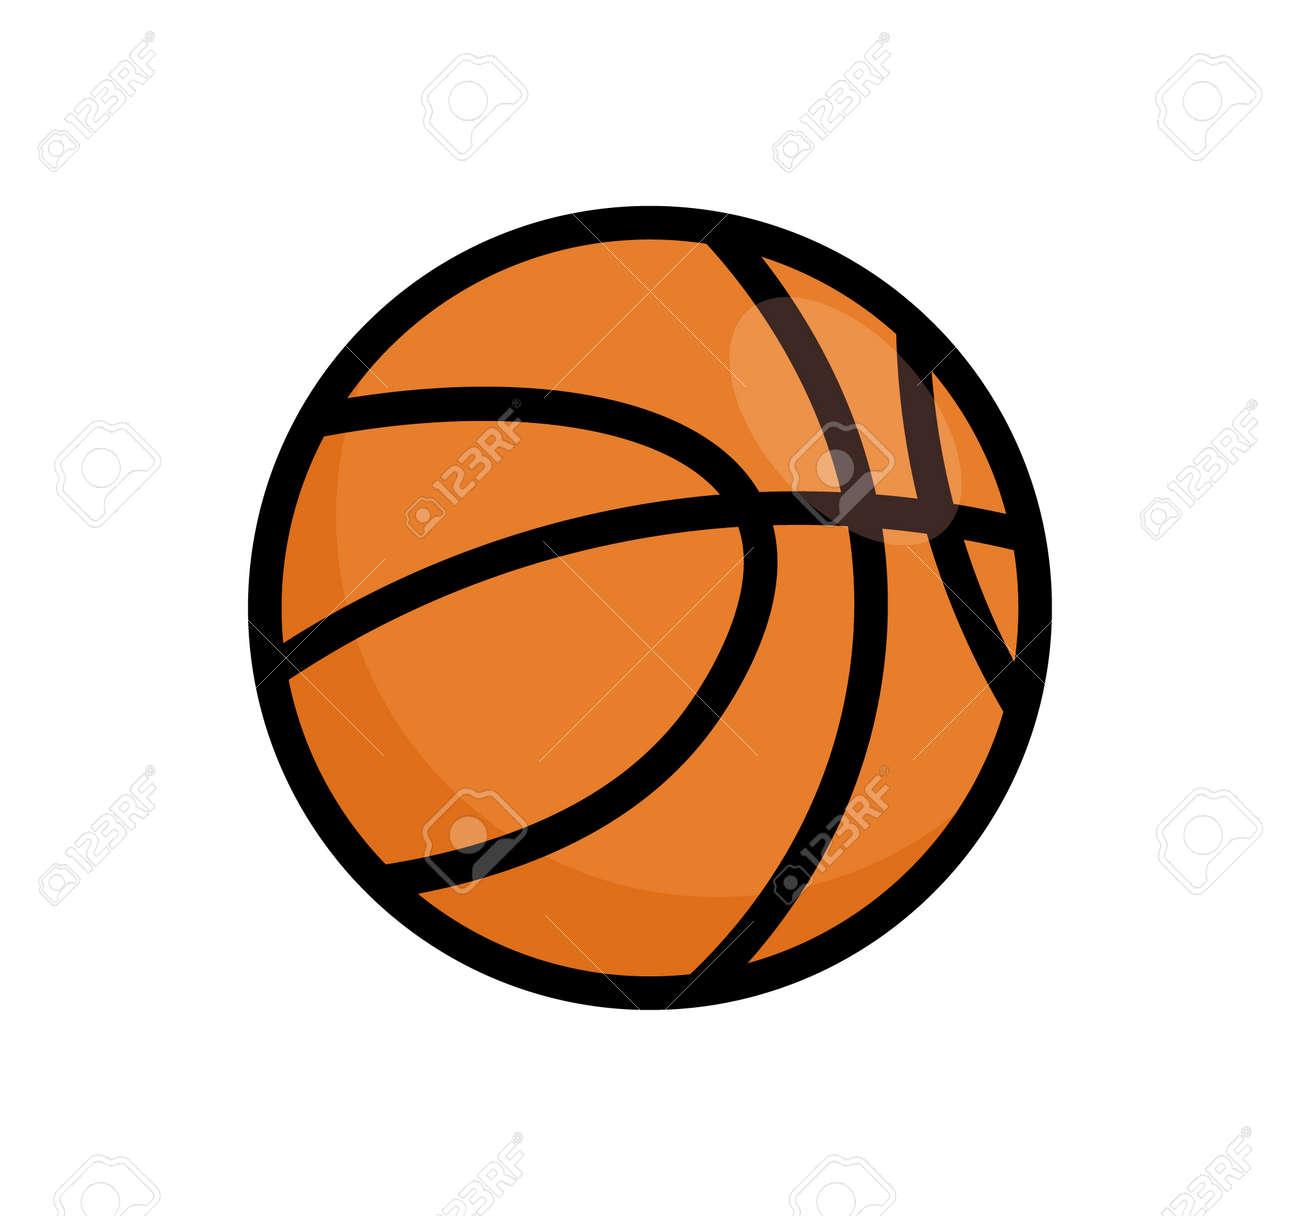 Basketball ball vector icon. Basket ball logo illustration flat isolated design orange minimal symbol - 168932604